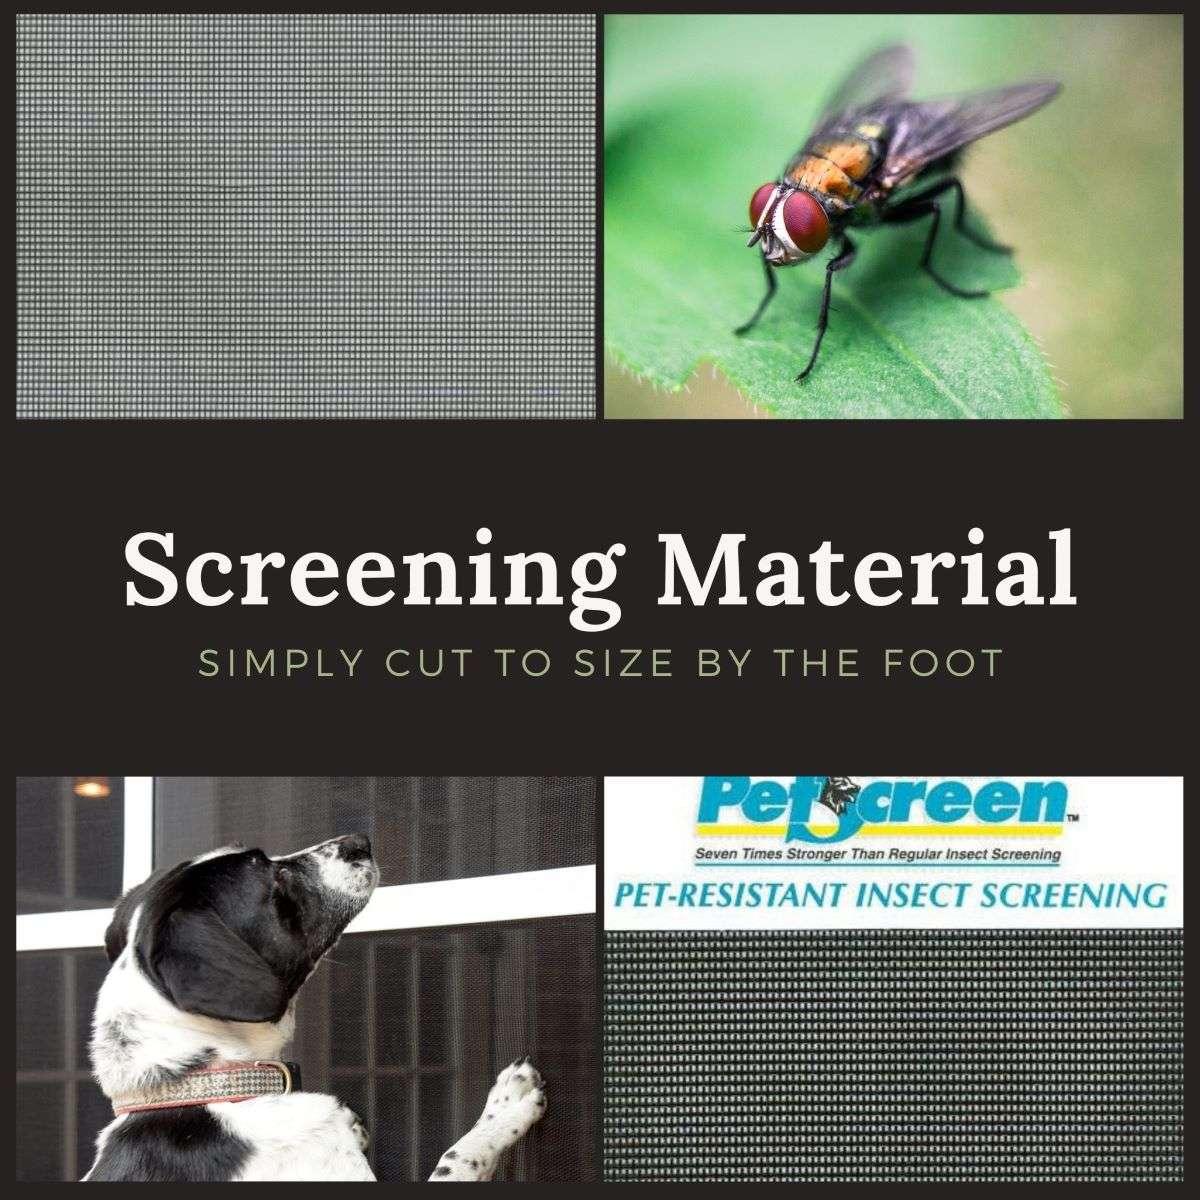 screening material category image